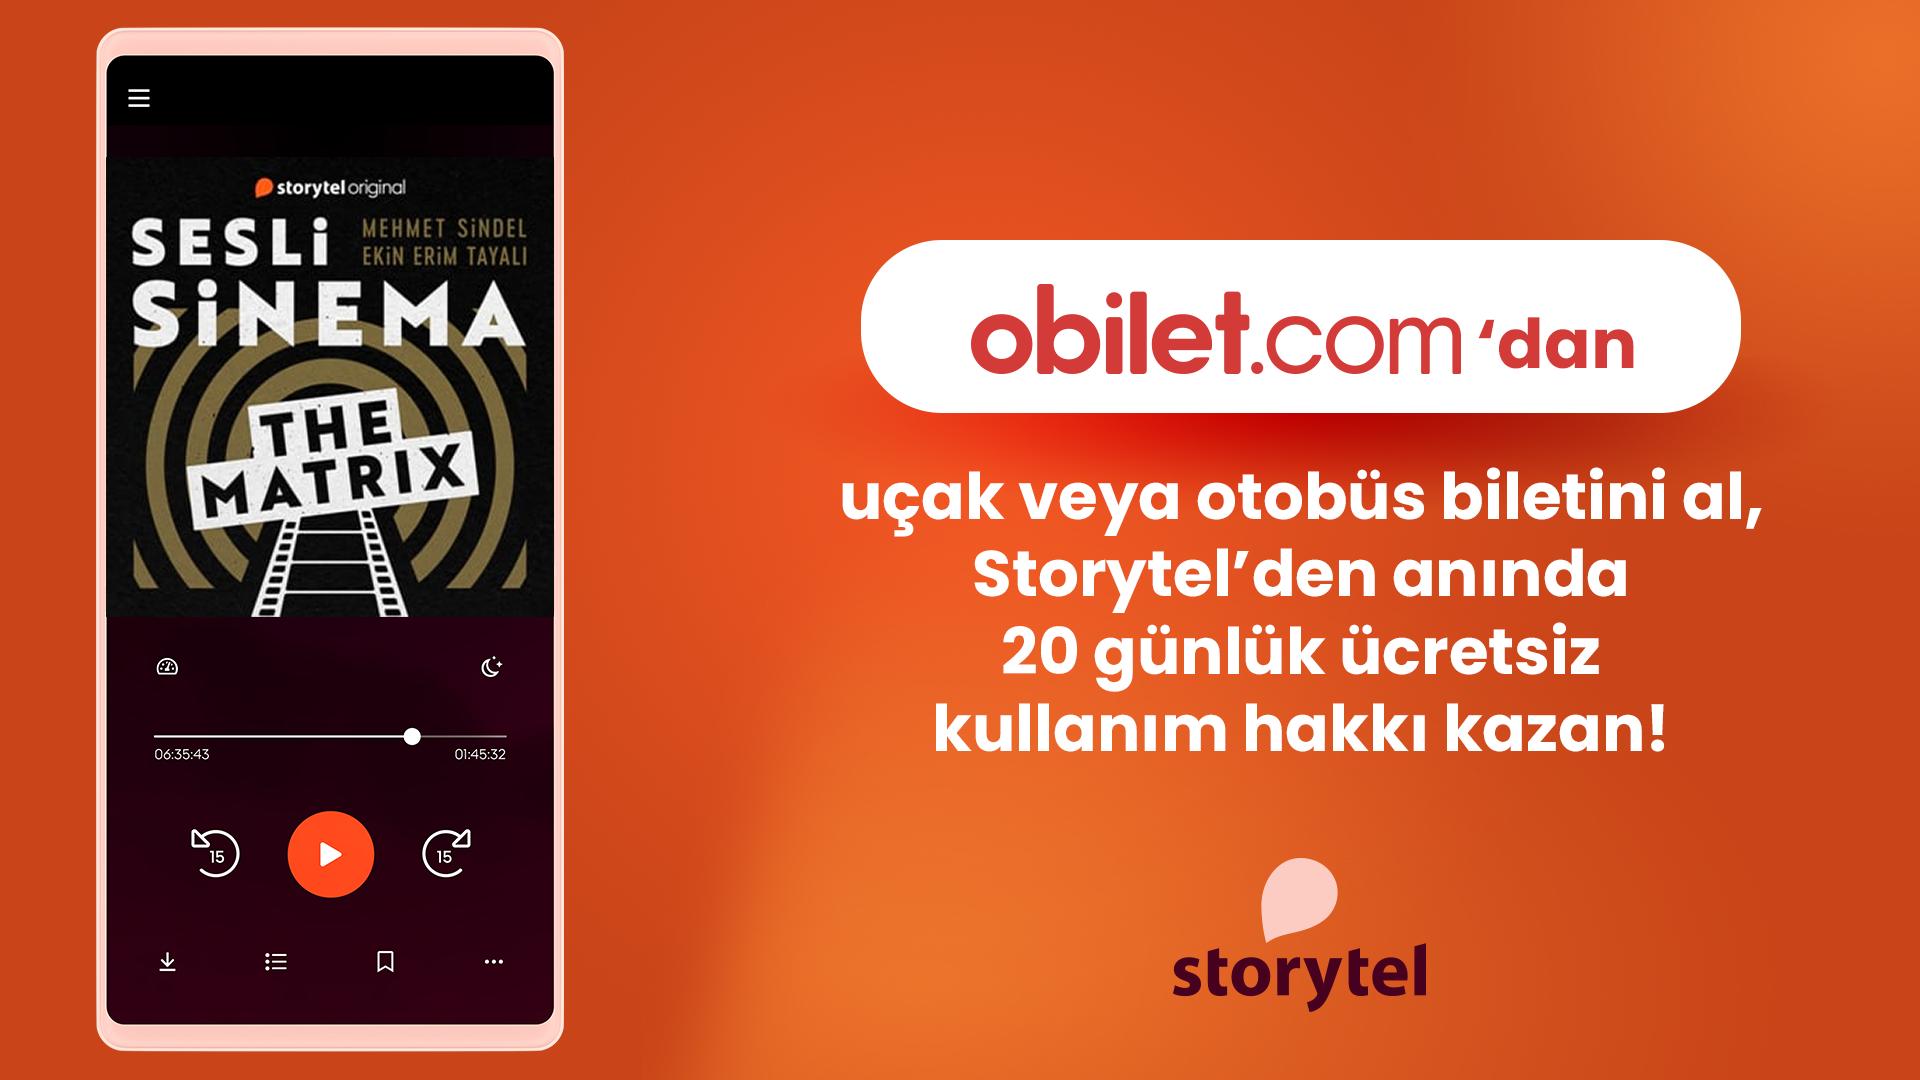 Obilet'ten Bilet Alana 20 Gün Ücretsiz Storytel!